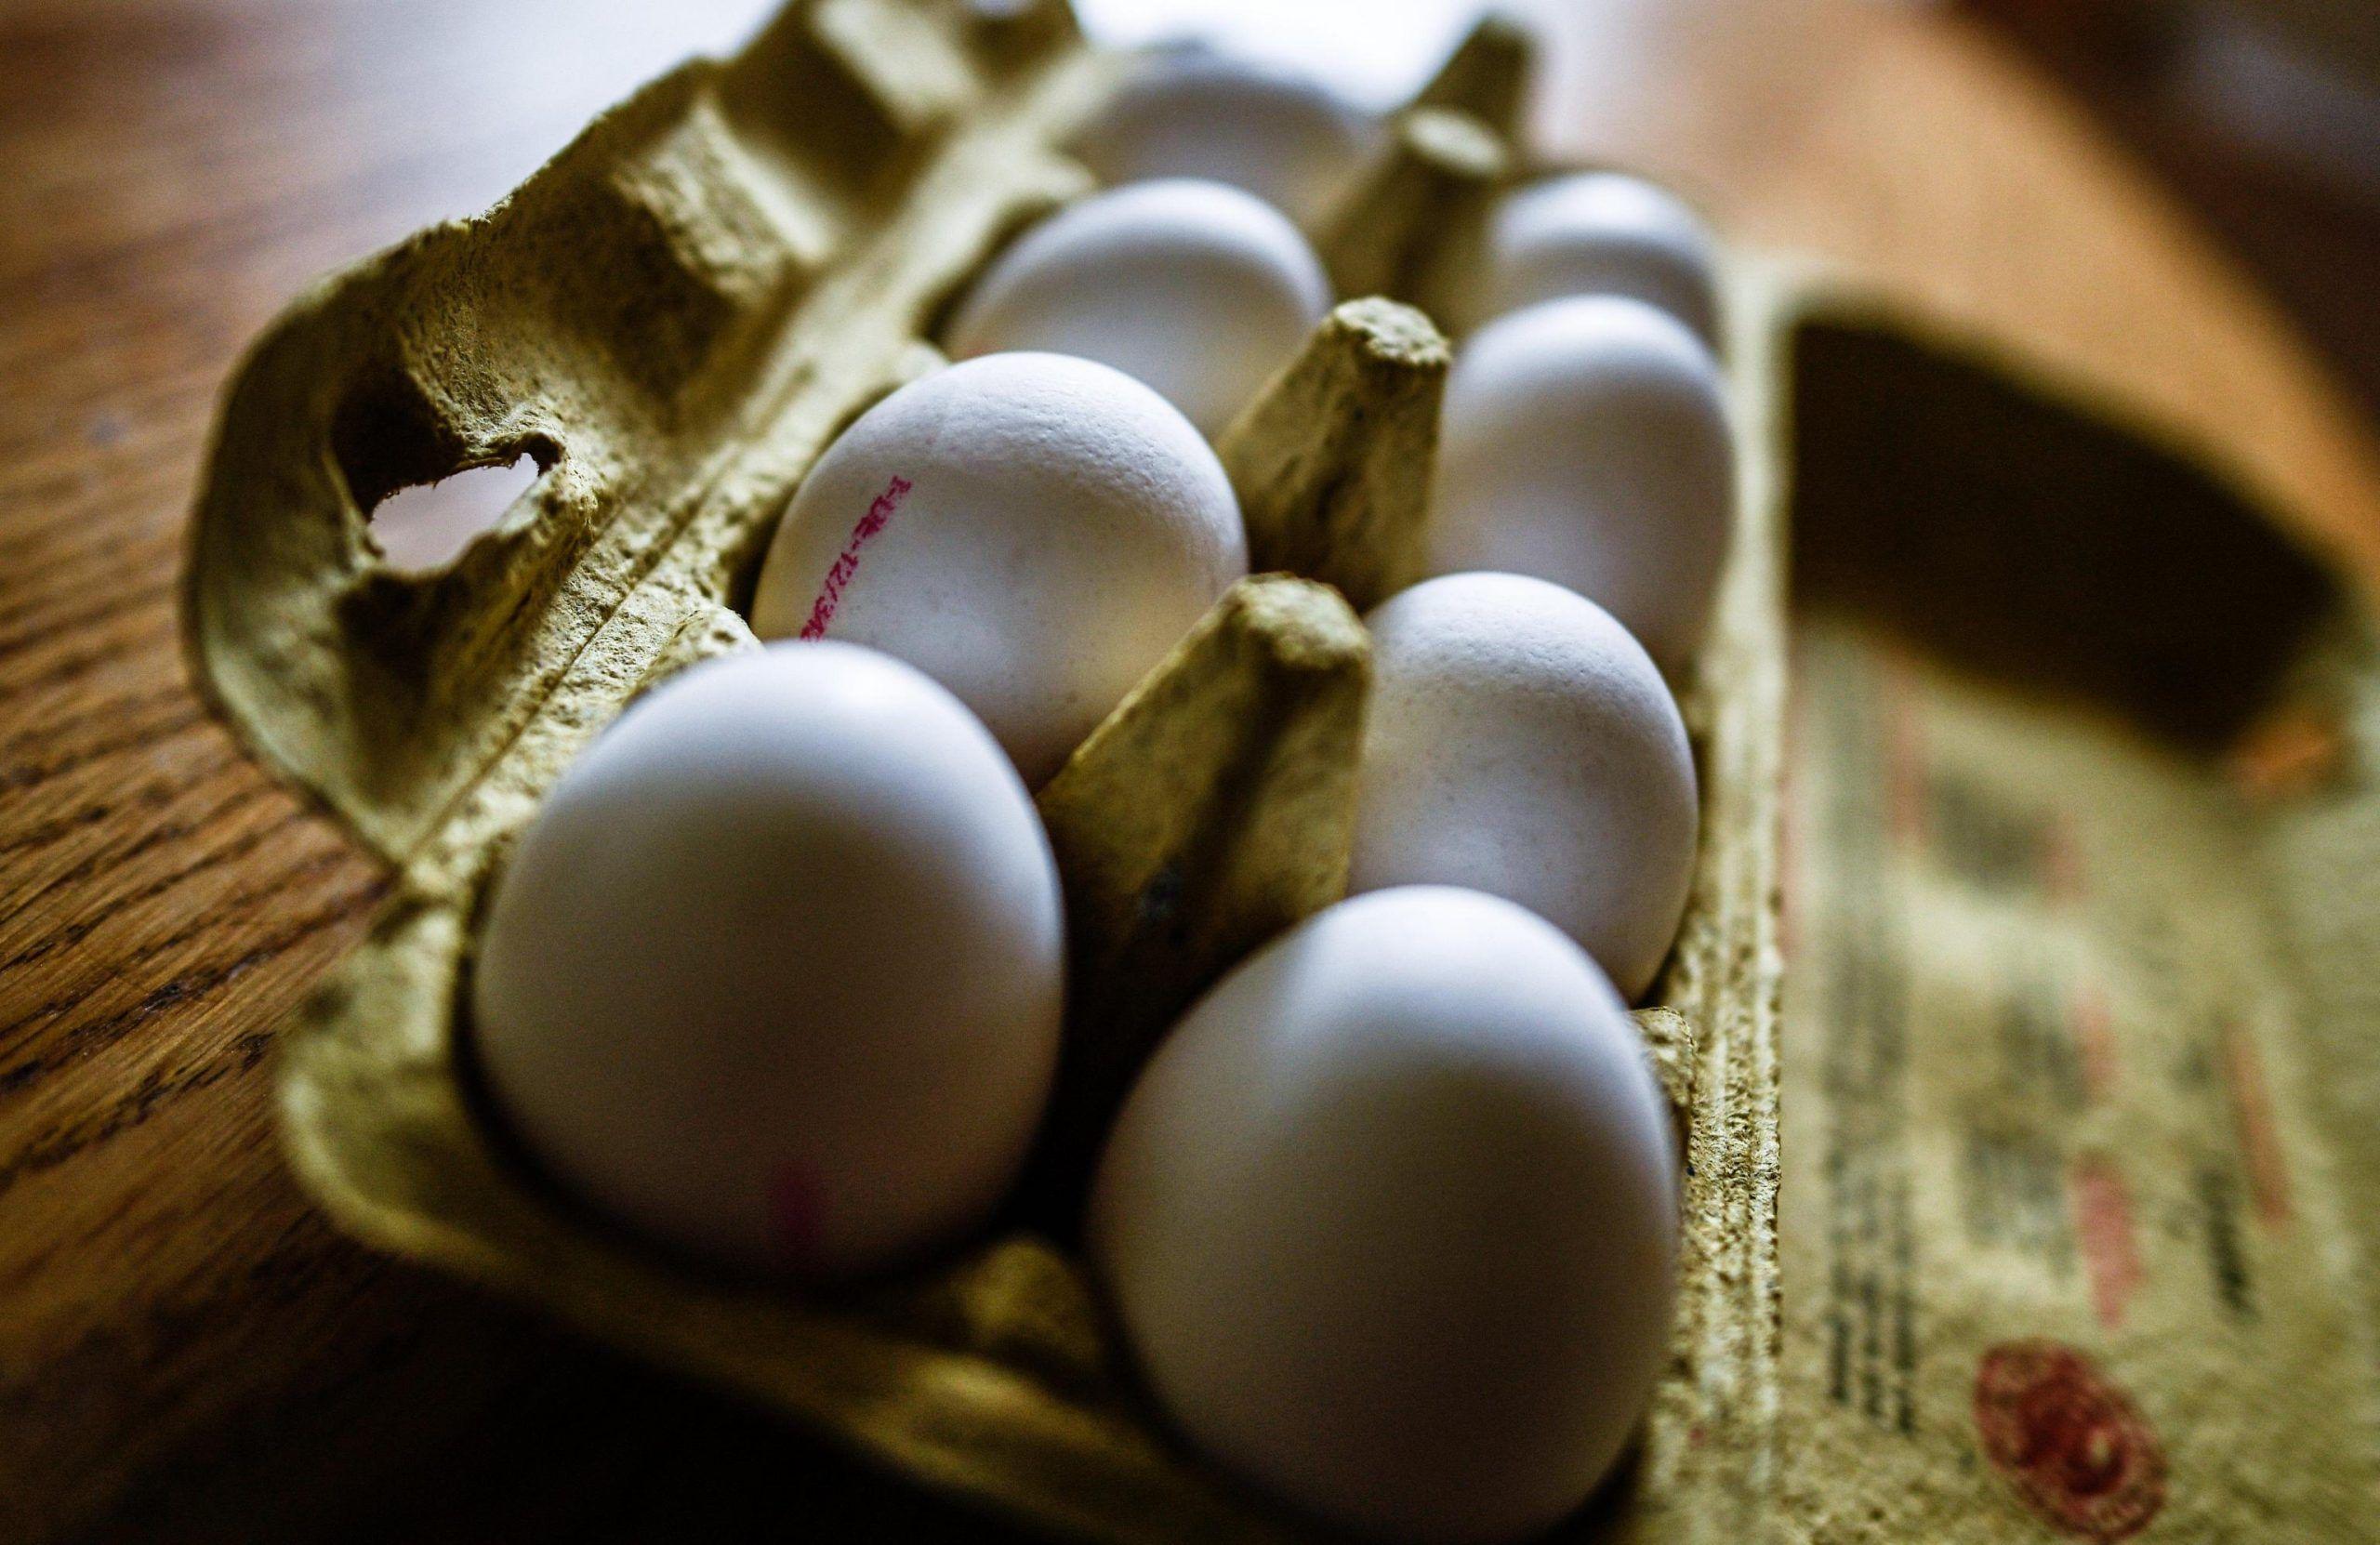 Fipronil uova sintomi cura rimedi rischi